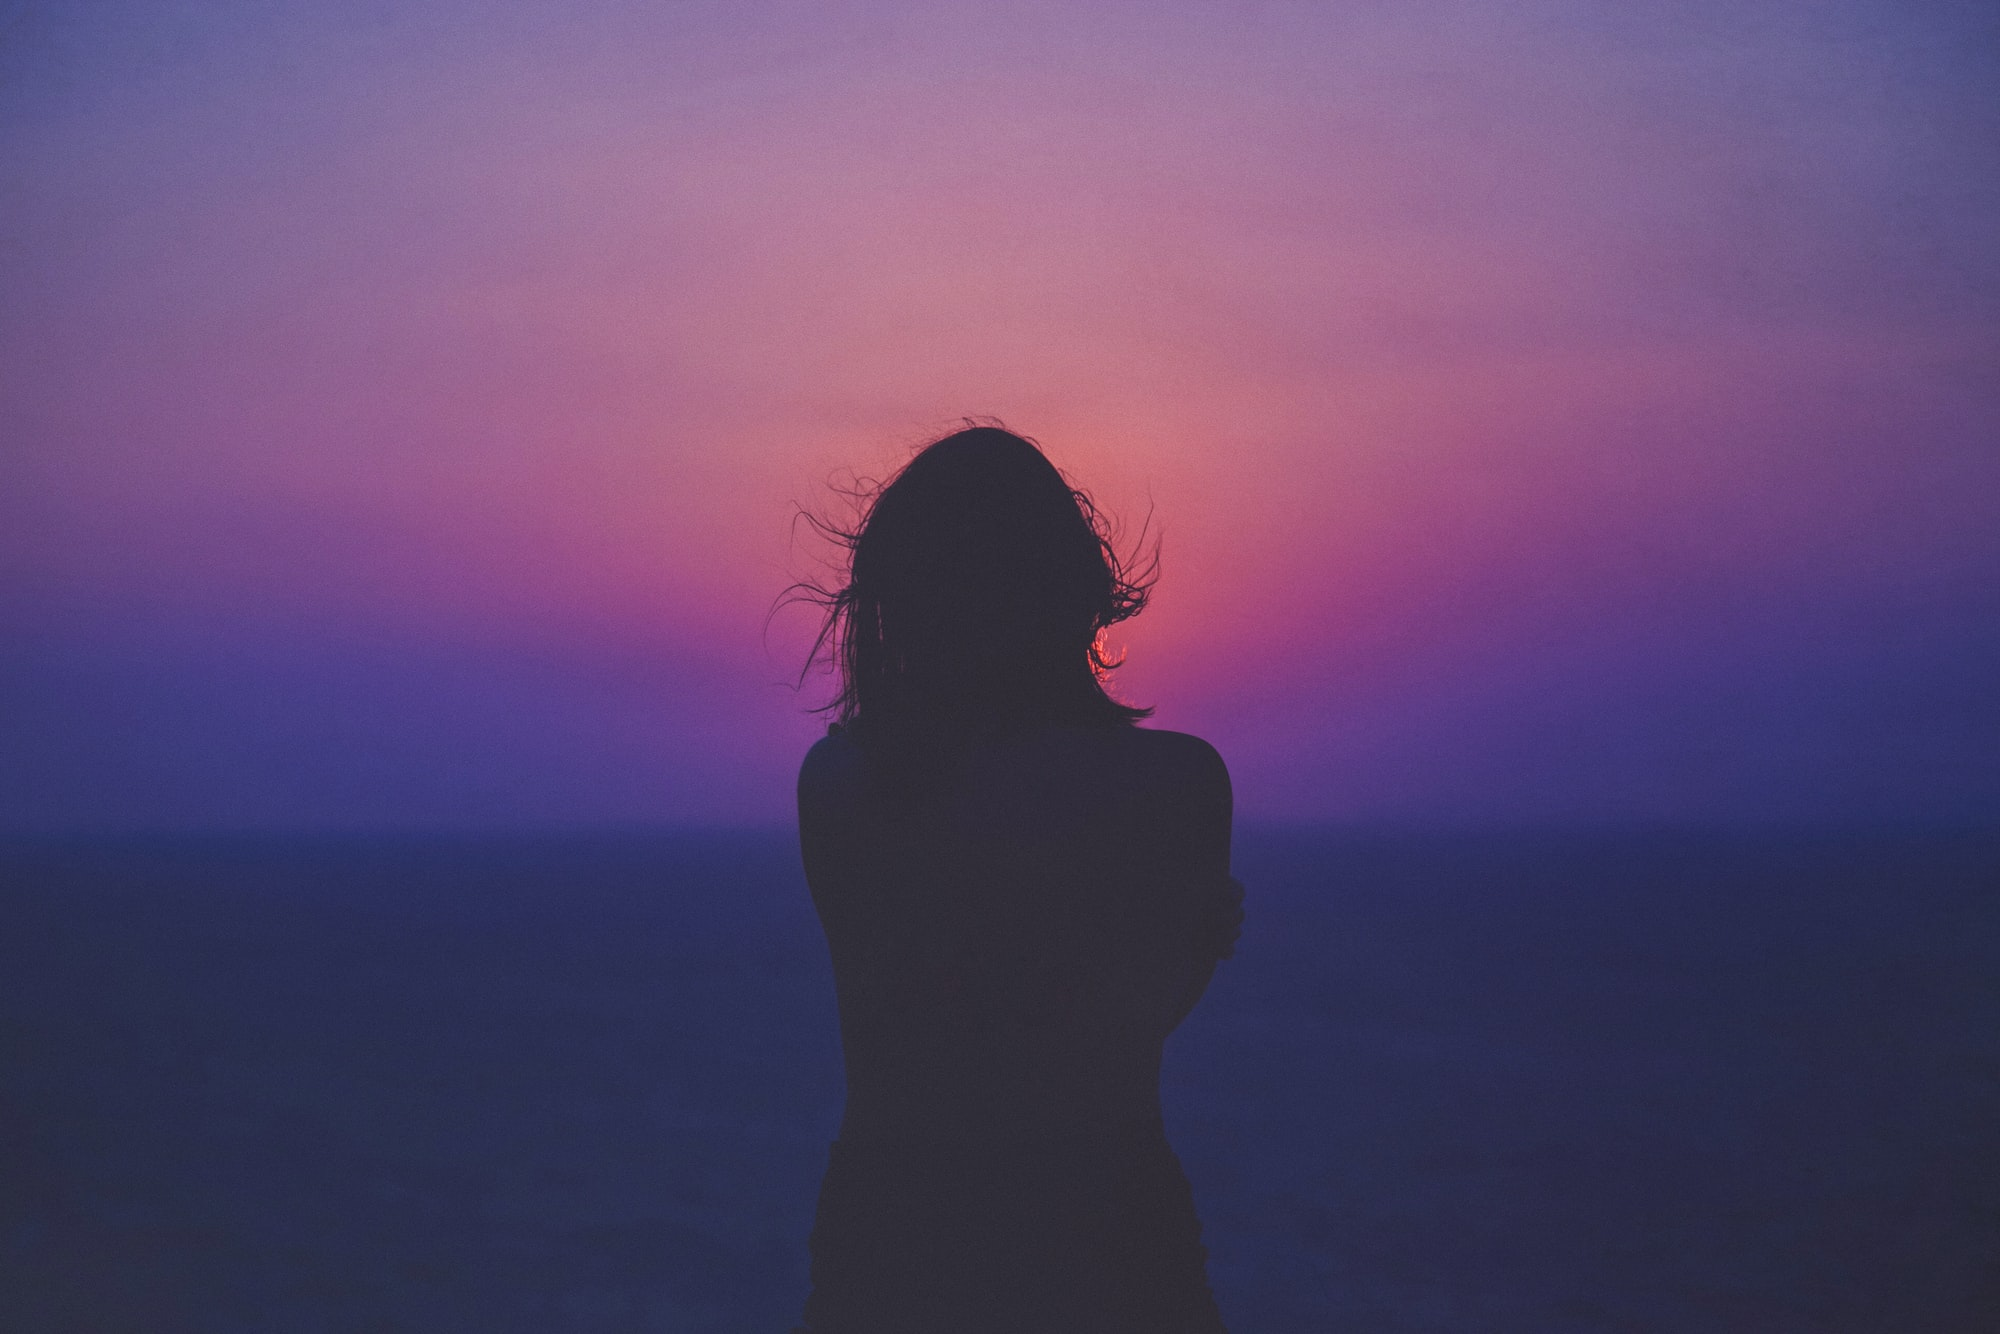 Toksična veza negativnih misli i depresije